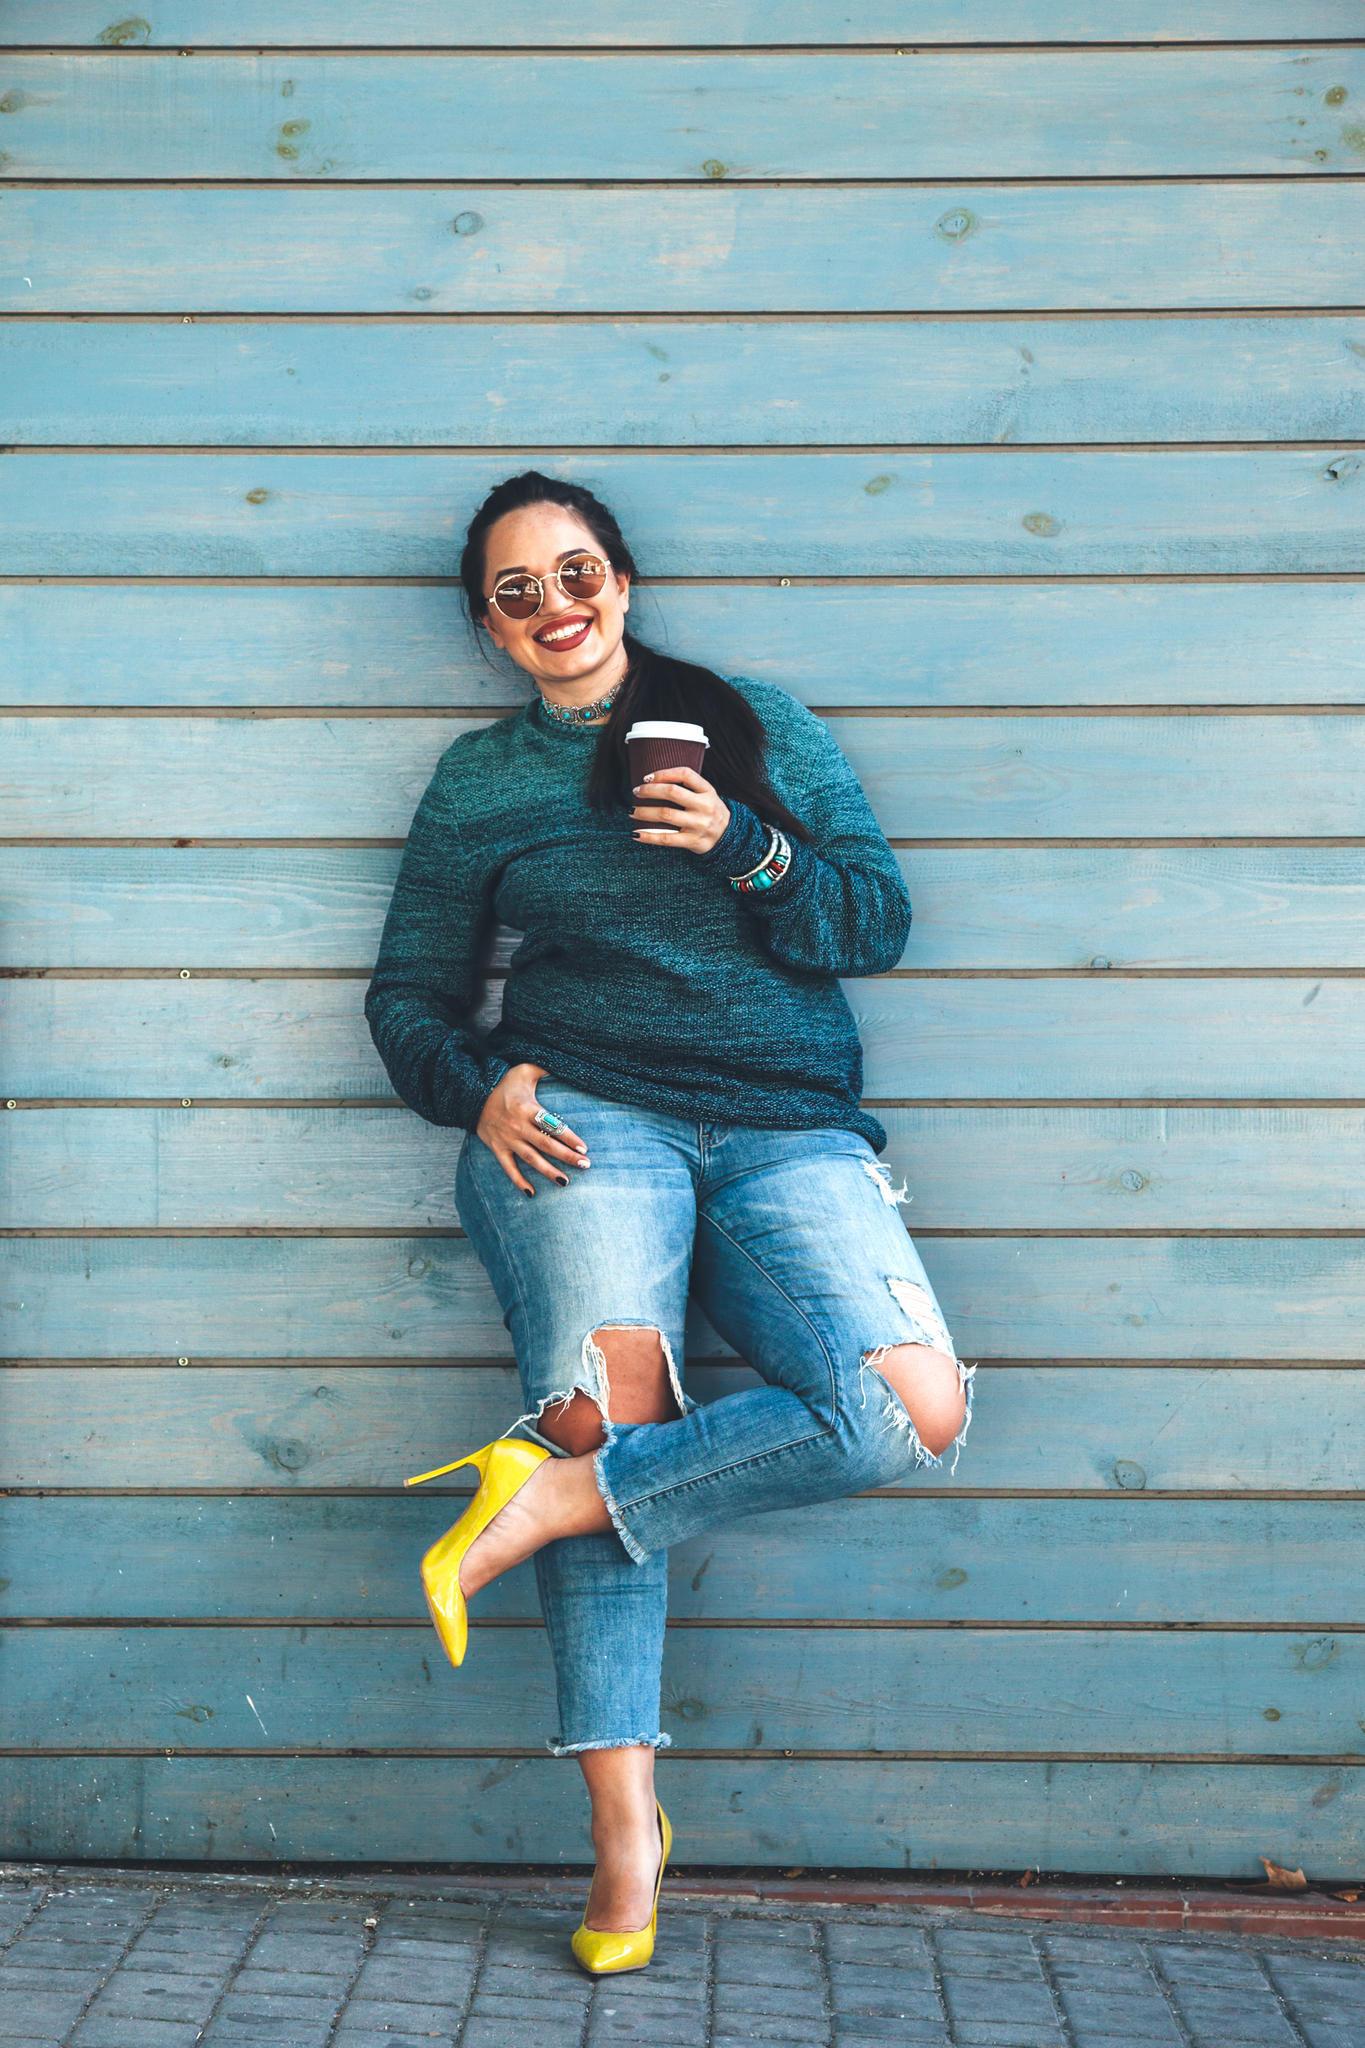 Kräftige Oberschenkel: Figurberatung: Diese Jeans